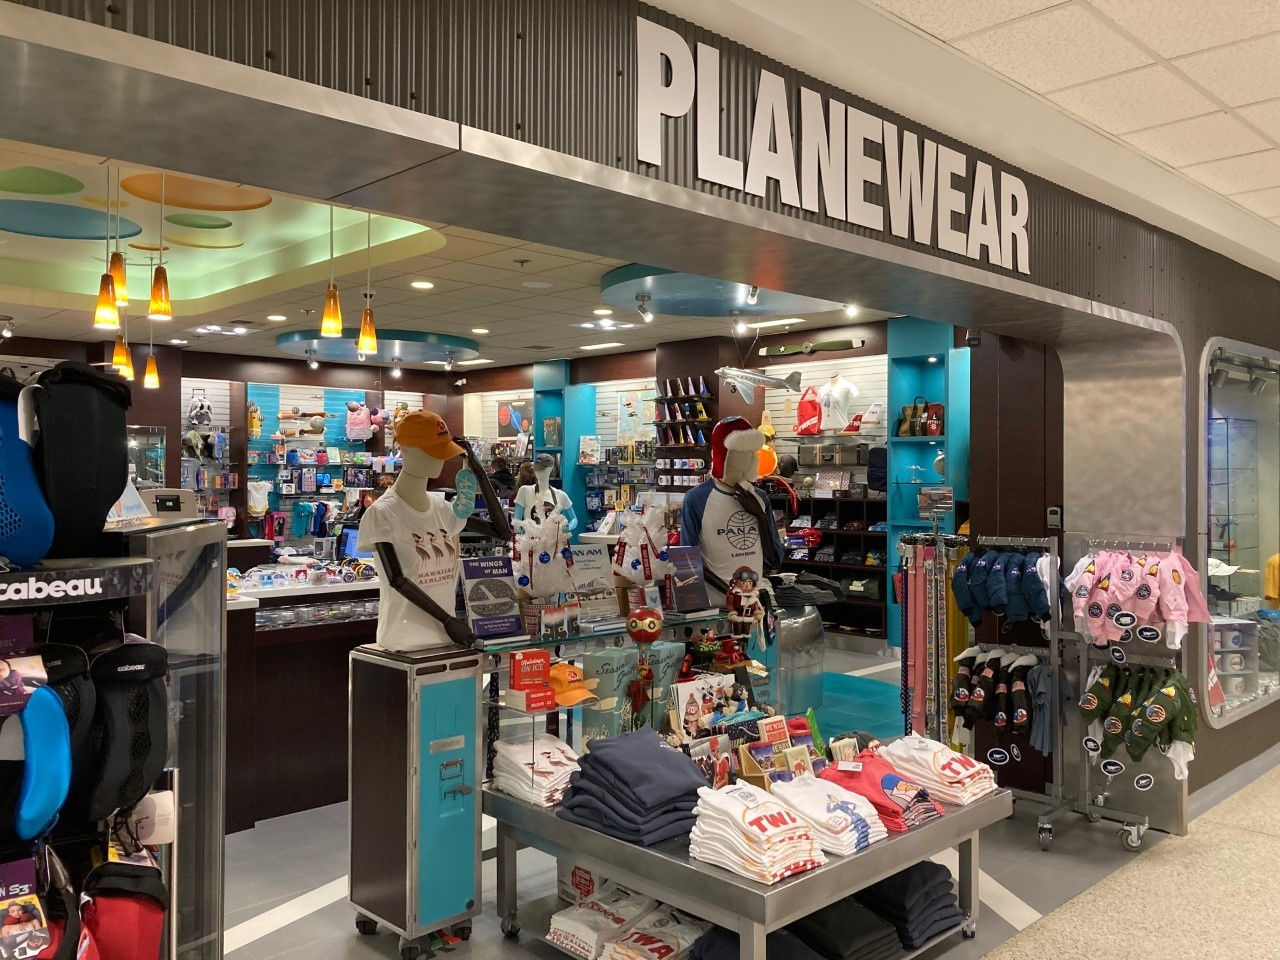 Planewear Store at SeaTac International Airport